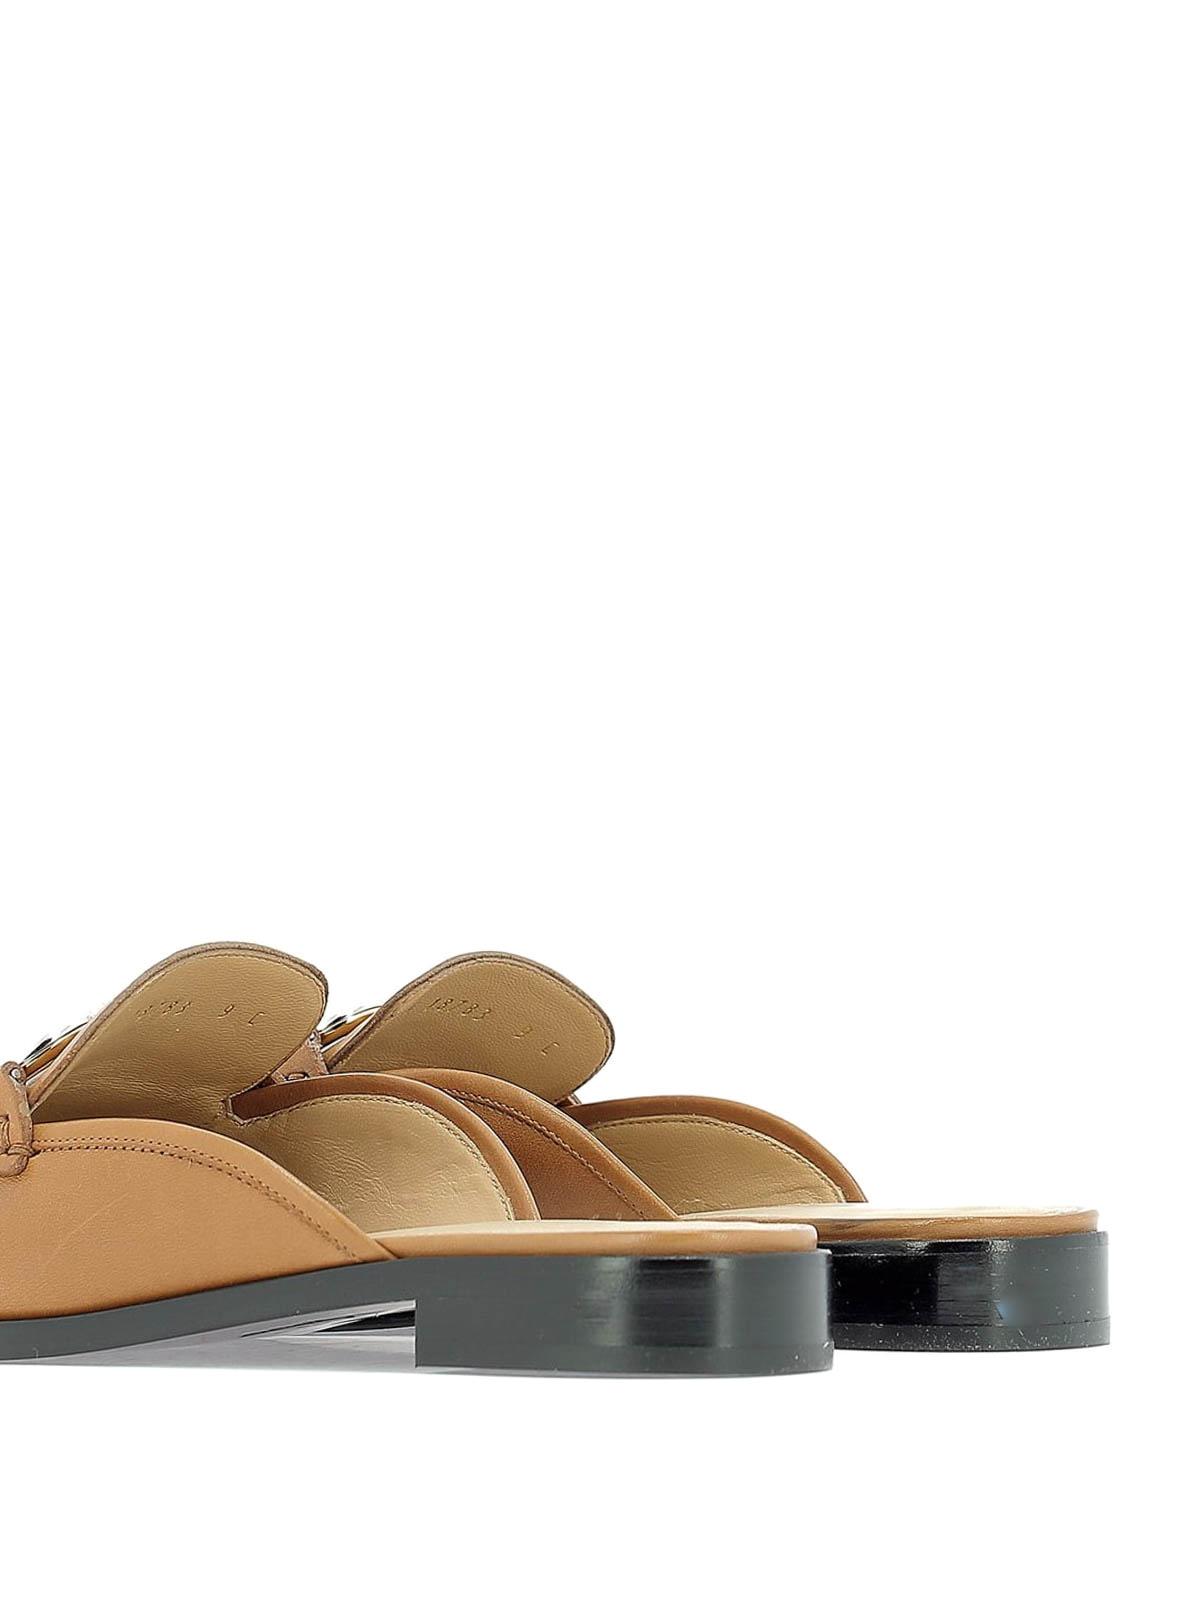 aef27ba4d60 Ikrix salvatore ferragamo loafers slippers viggio slippers jpg 1200x1600 Salvatore  ferragamo slippers